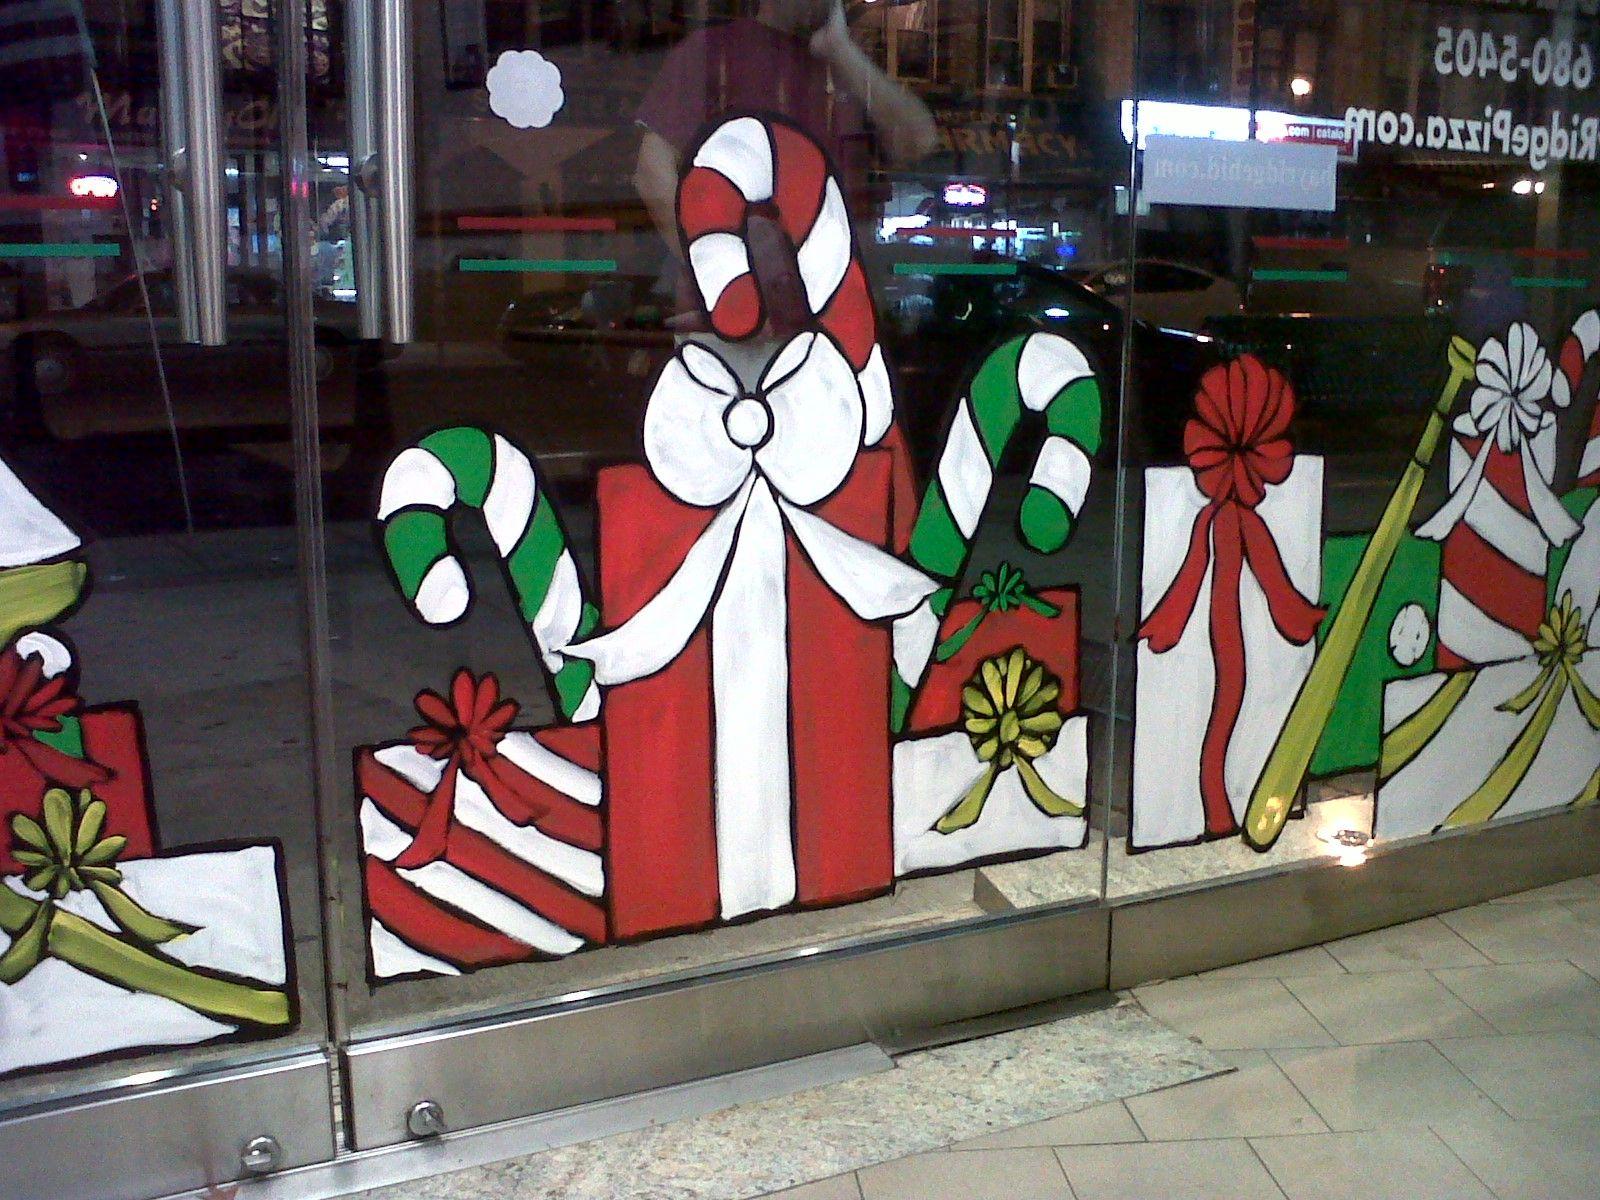 brooklyn-20111128-005431 1,600×1,200 pixels | christmas